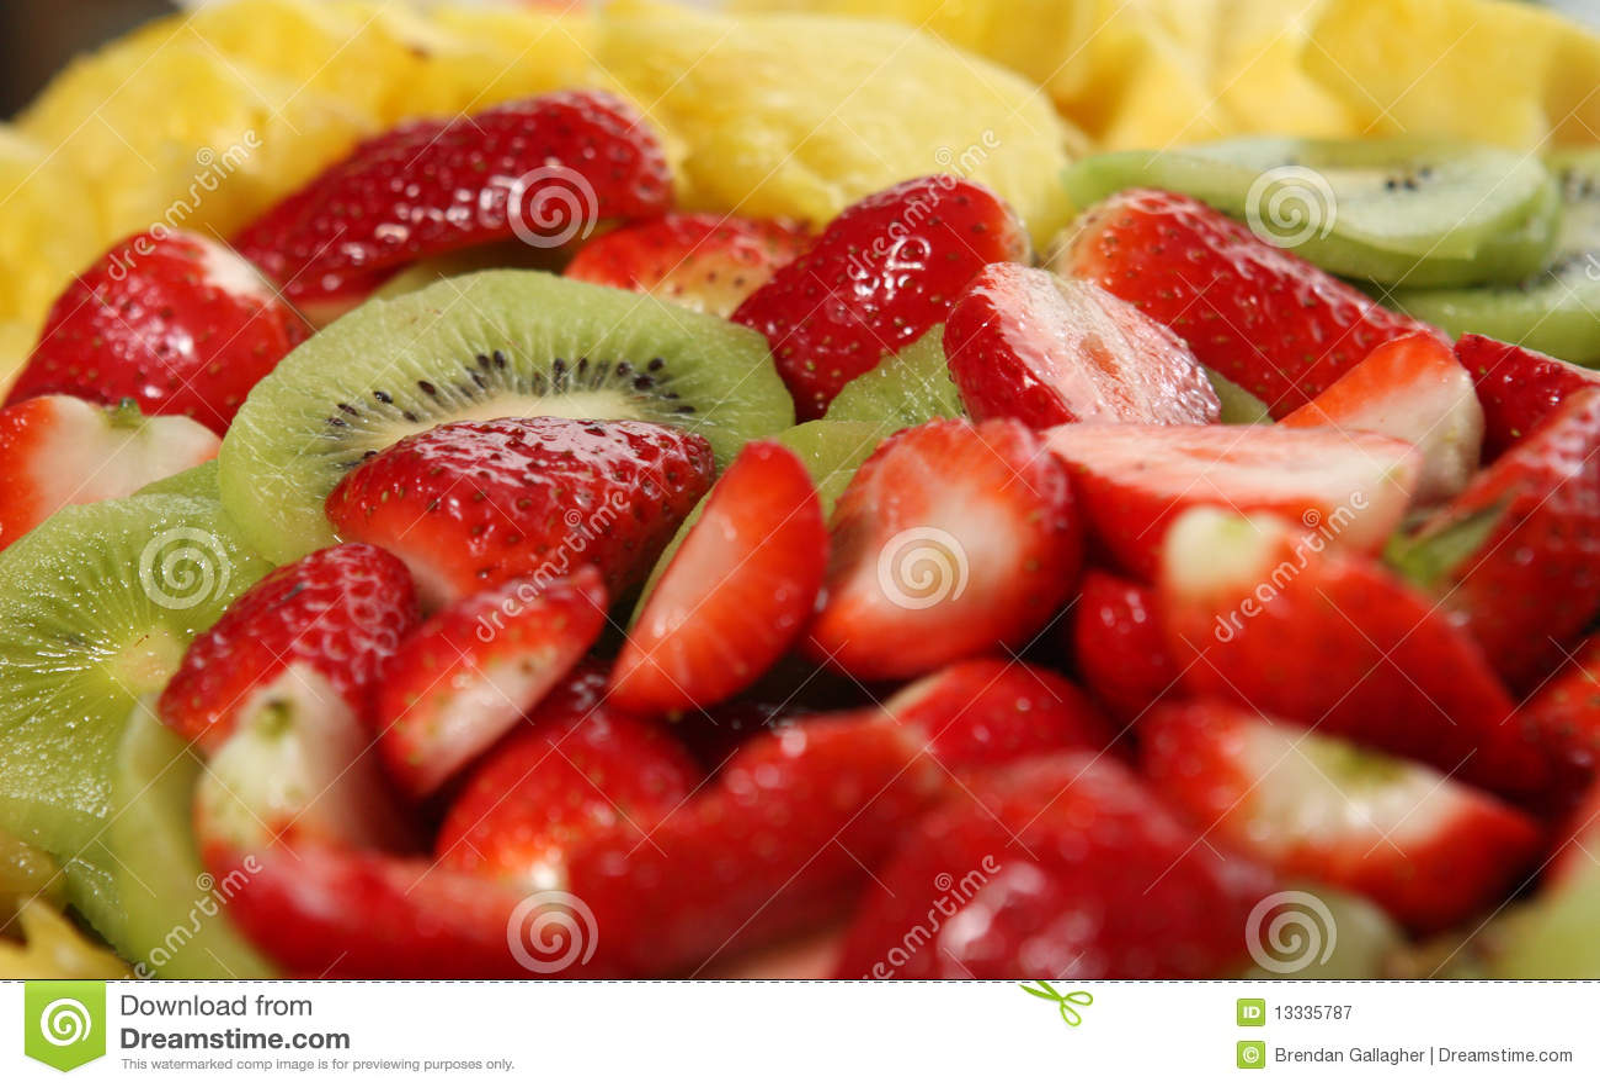 Owocowy półmisek